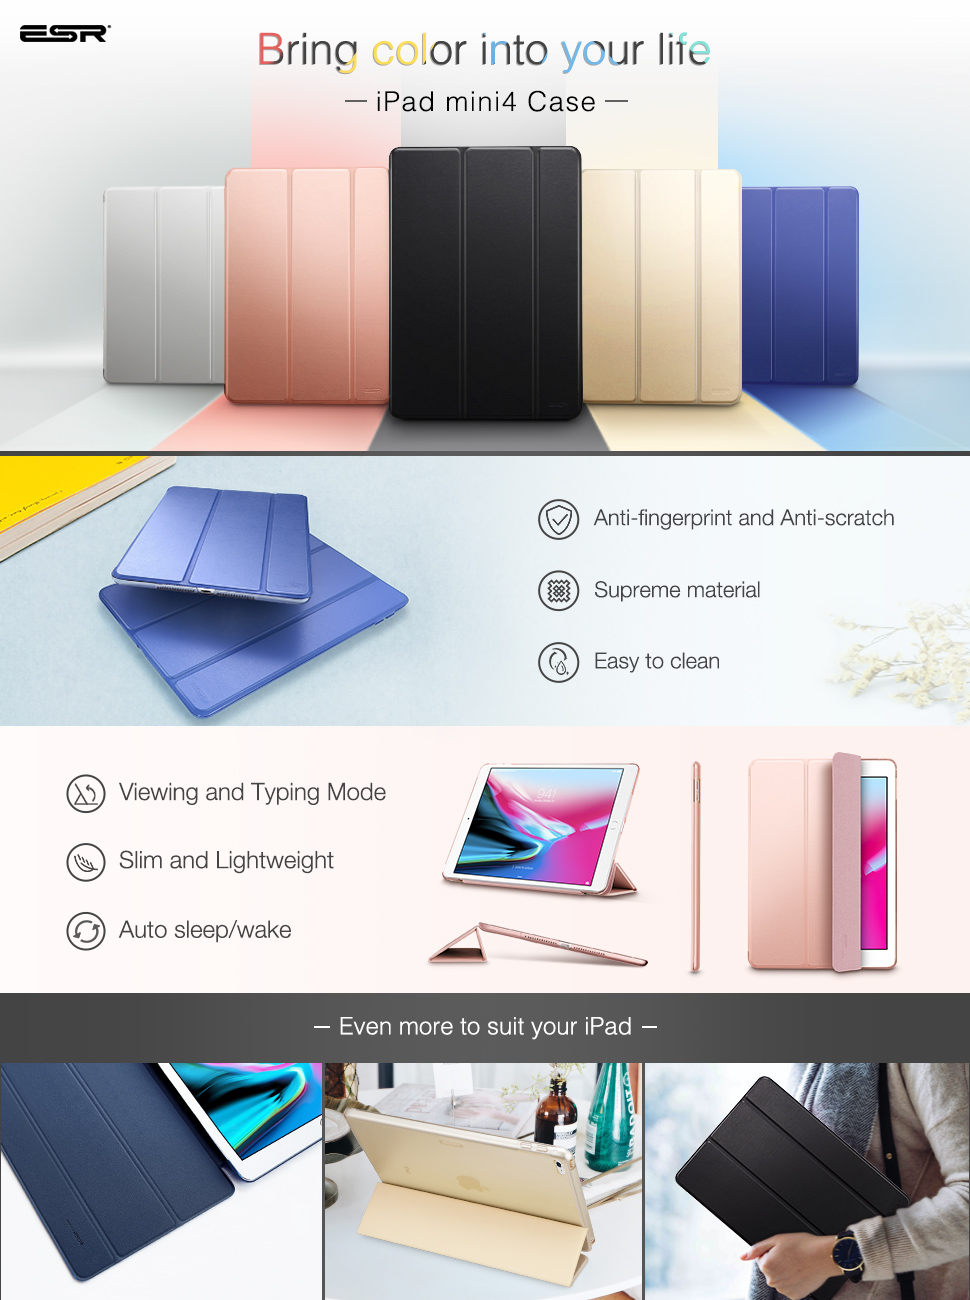 ESR Yippee Color Plus for iPad mini 4, Black - Gohub Shop